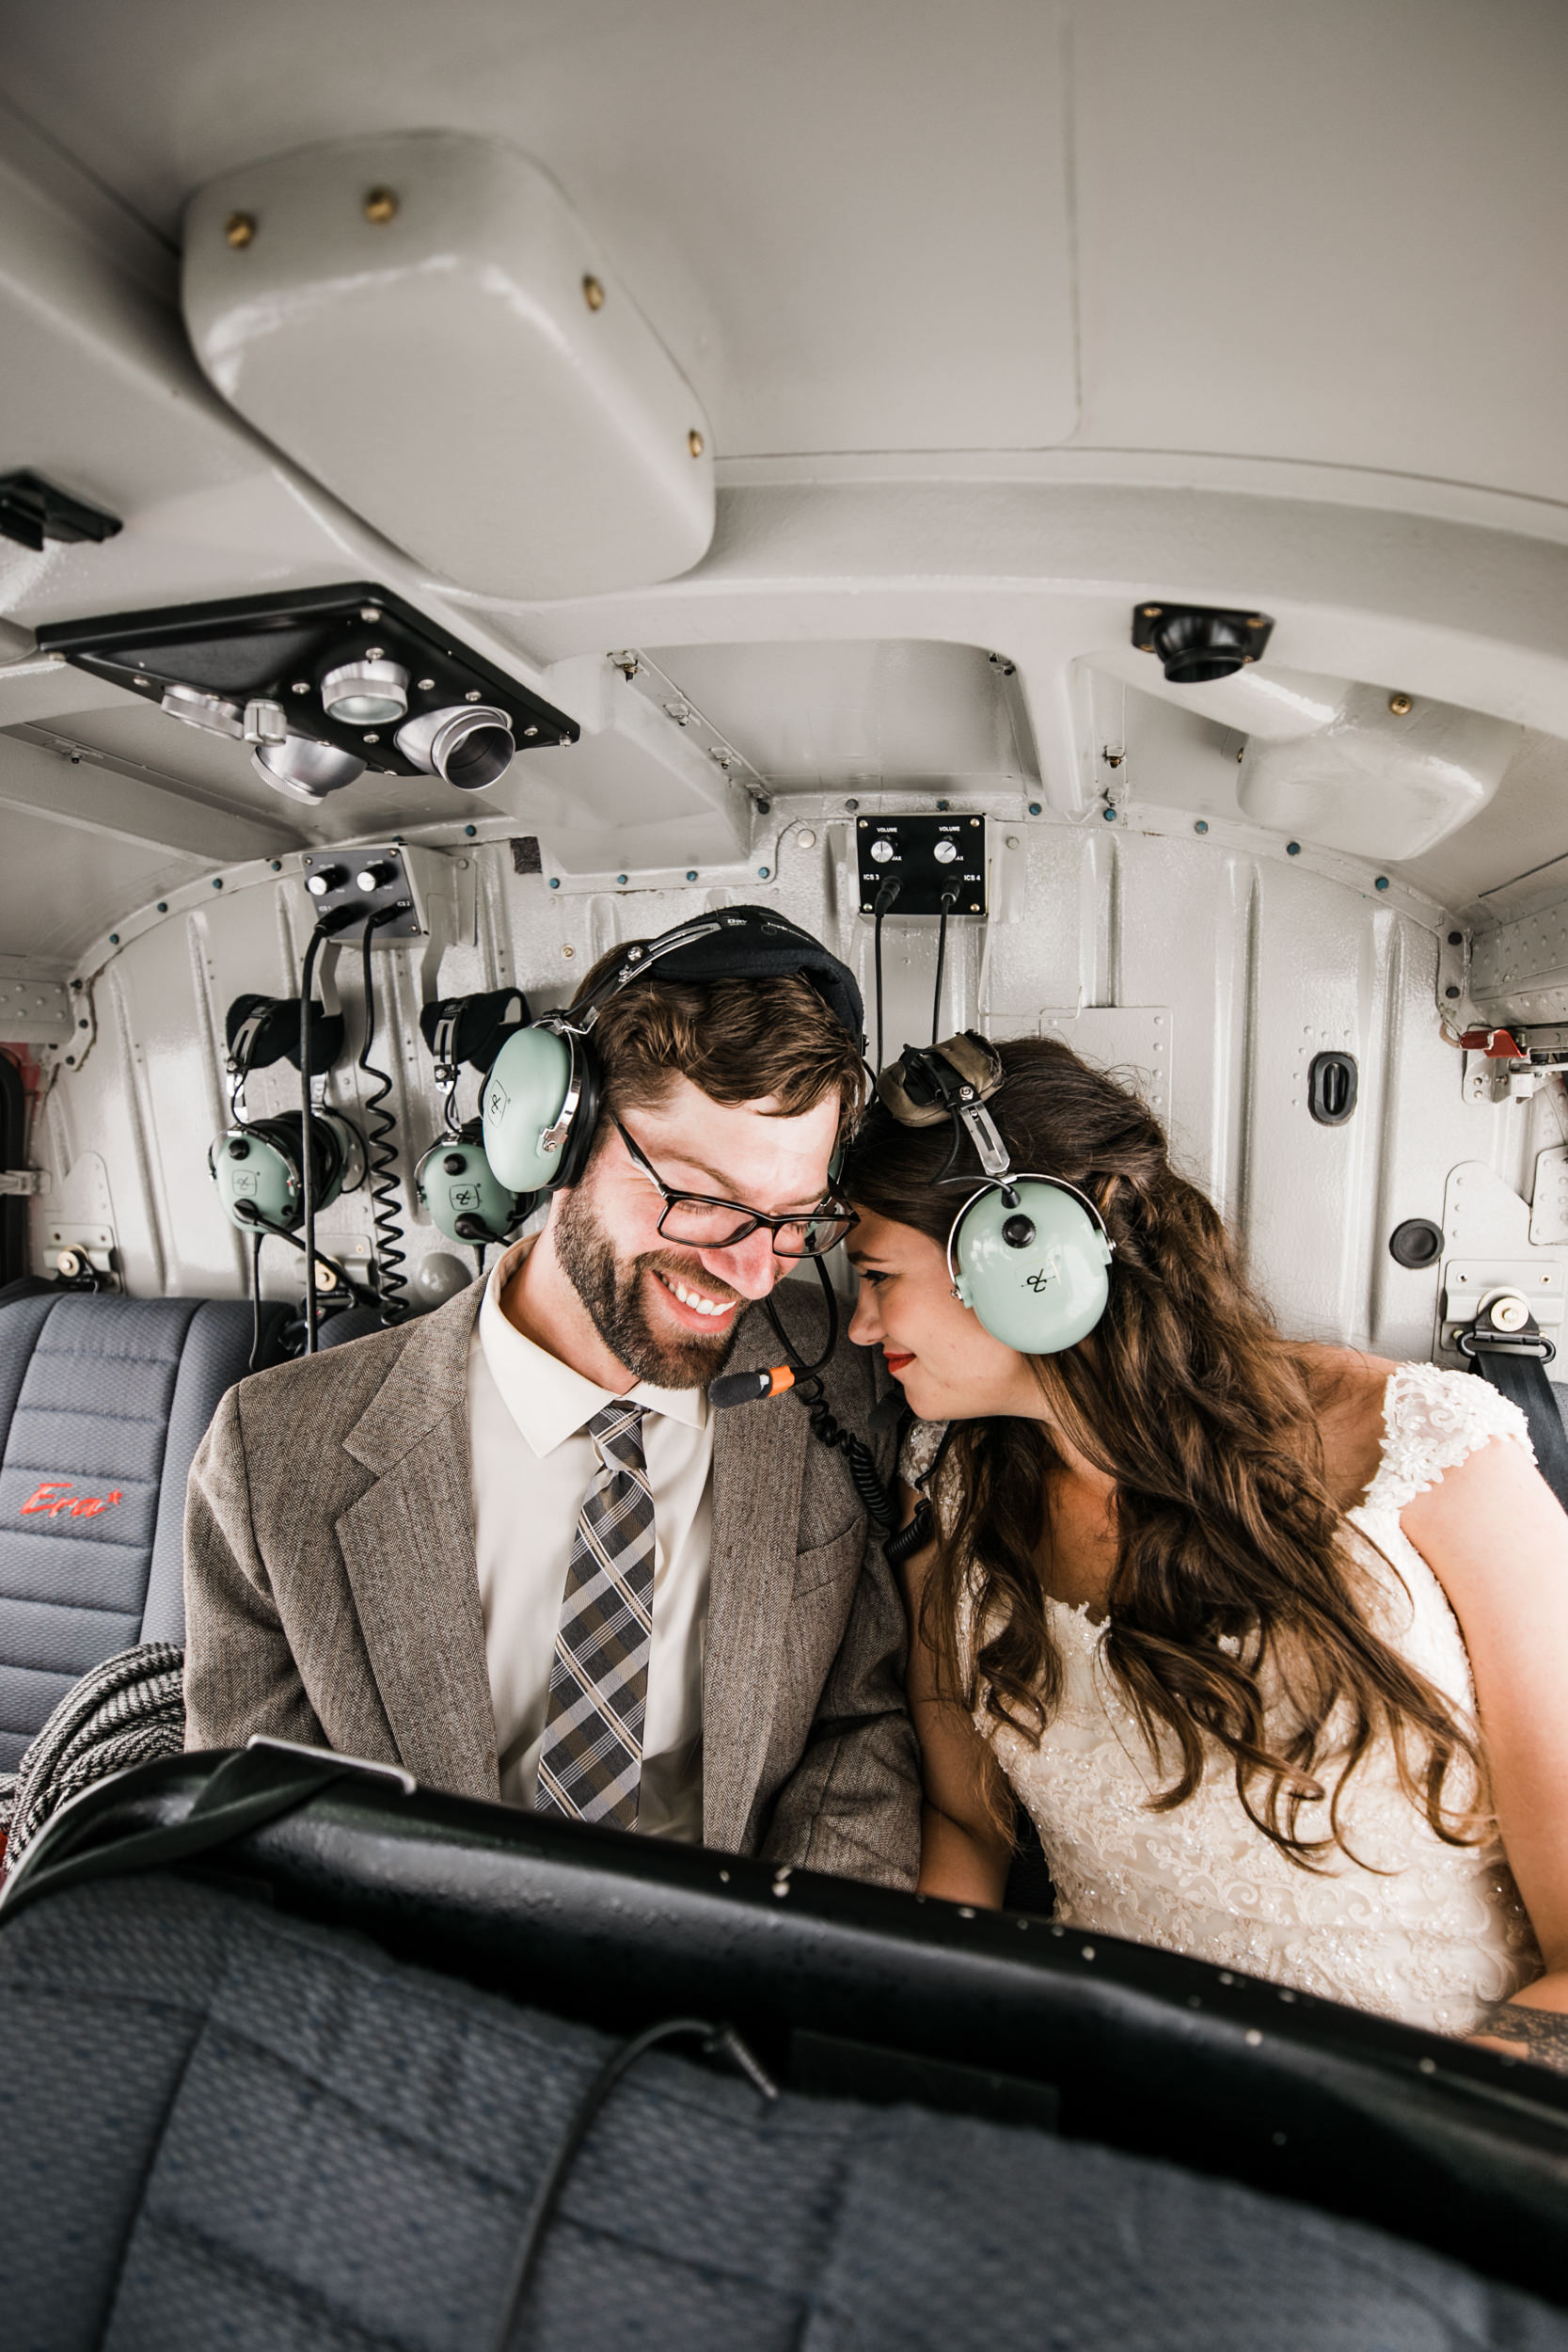 helicopter flightseeing tour in denali national park | alaska destination elopement inspiration | heli wedding in alaska | the hearnes adventure photography | www.thehearnes.com